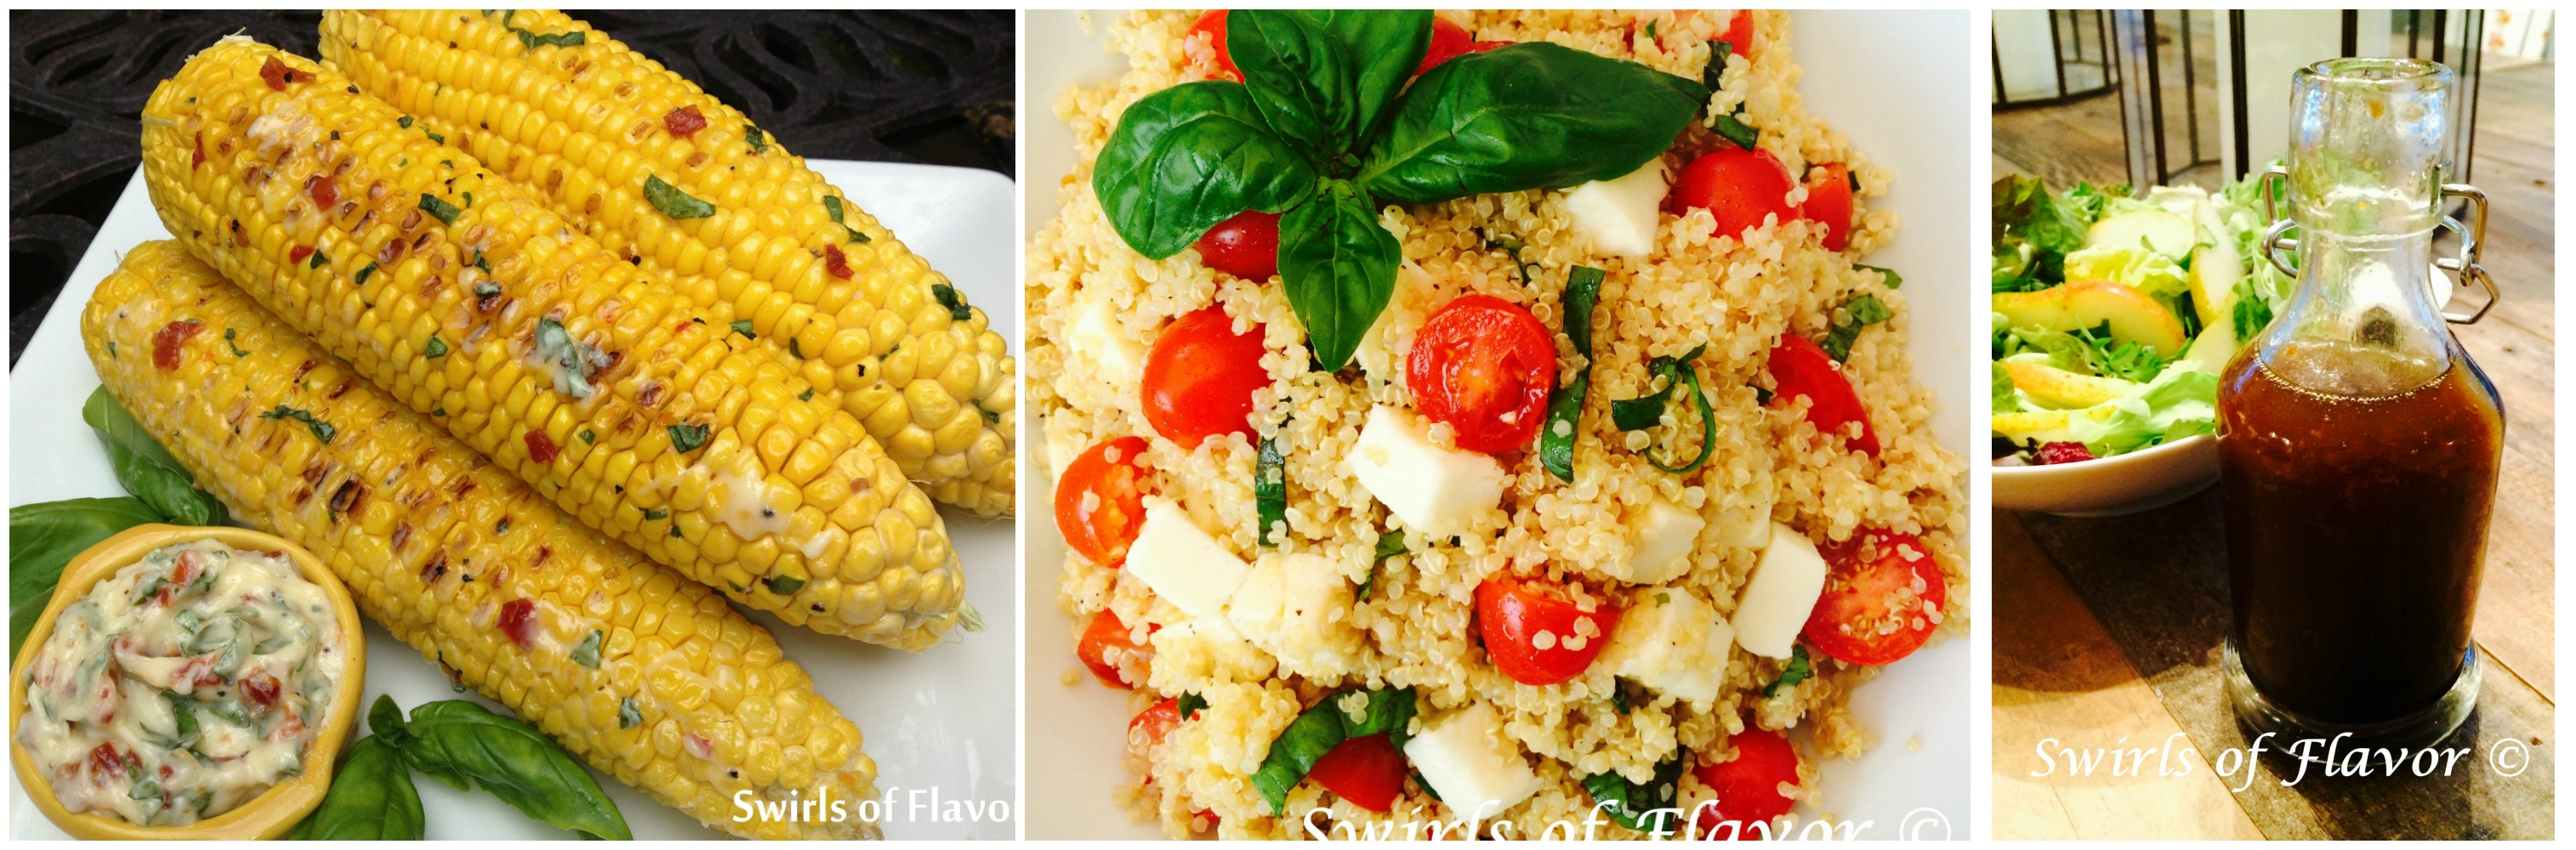 Corn on the Cob; Caprese Quinoa and Honey Orange Balsamic Vinaigrette